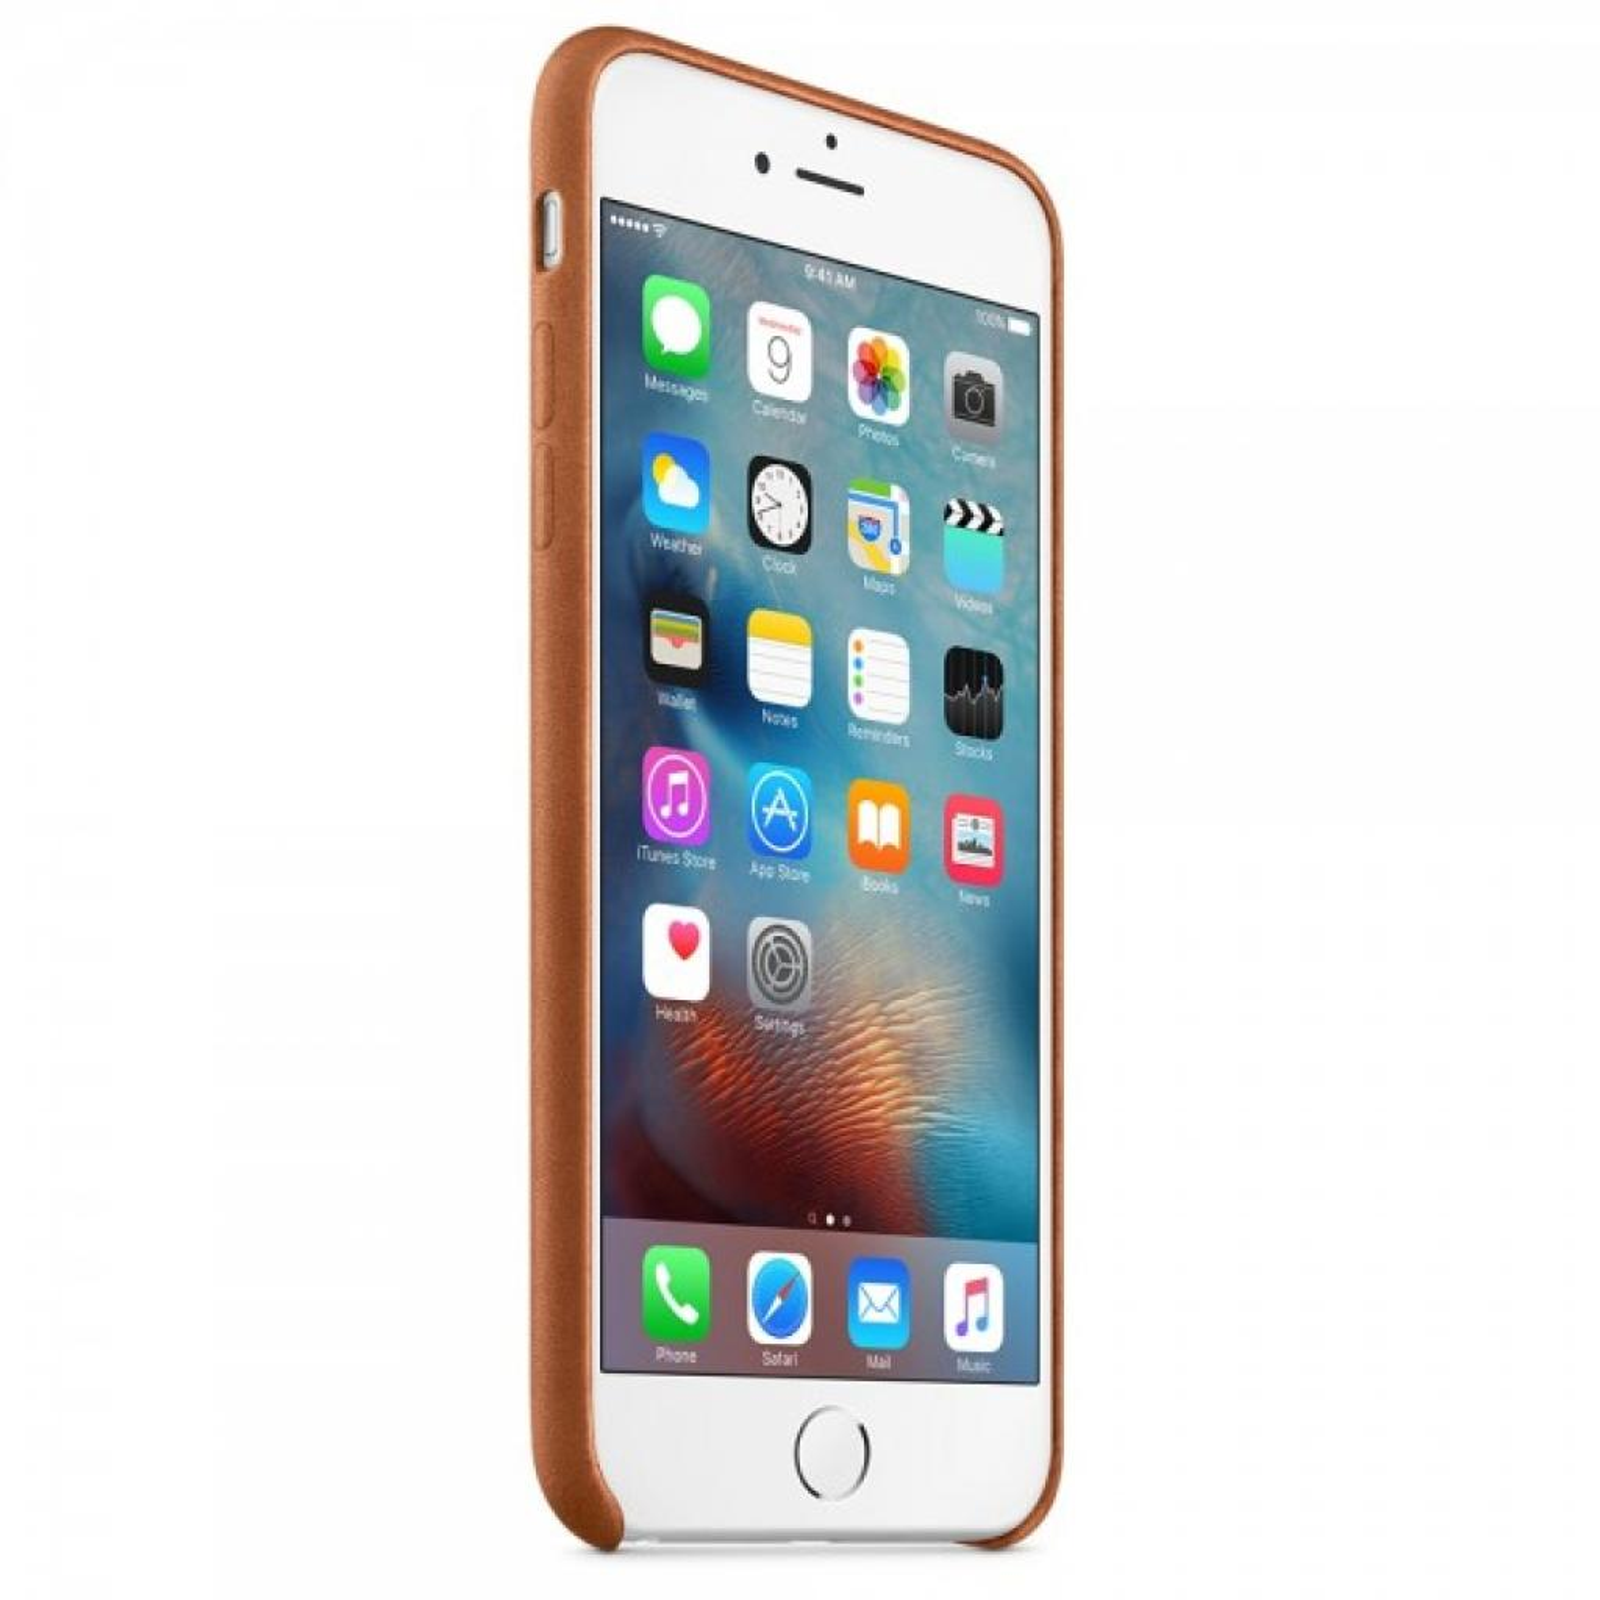 Чехол для моб. телефона Apple для iPhone 6 Plus/6s Plus Saddle Brown (MKXC2ZM/A) изображение 3